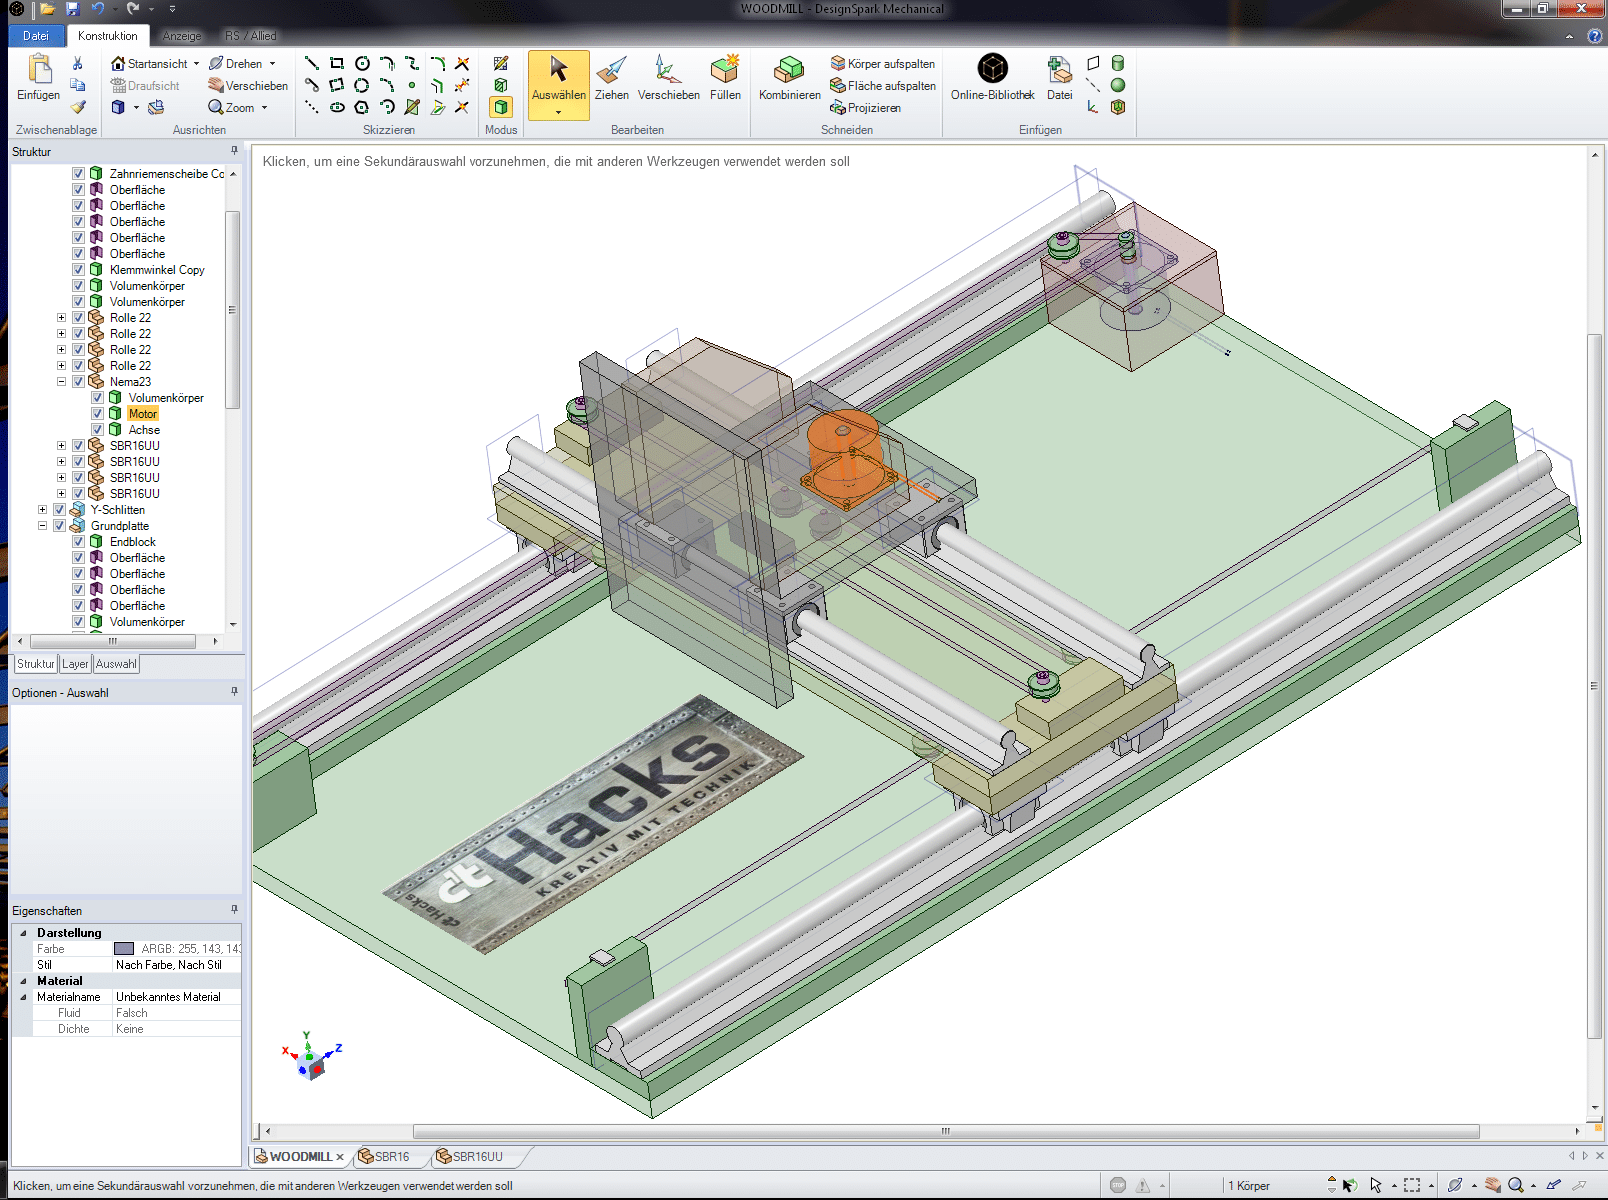 Modell unserer neuen CNC-Portalfräse aus Multiplex-Holz und Standard-Teilen, hier mit ausgeblendeten Bemaßungen.